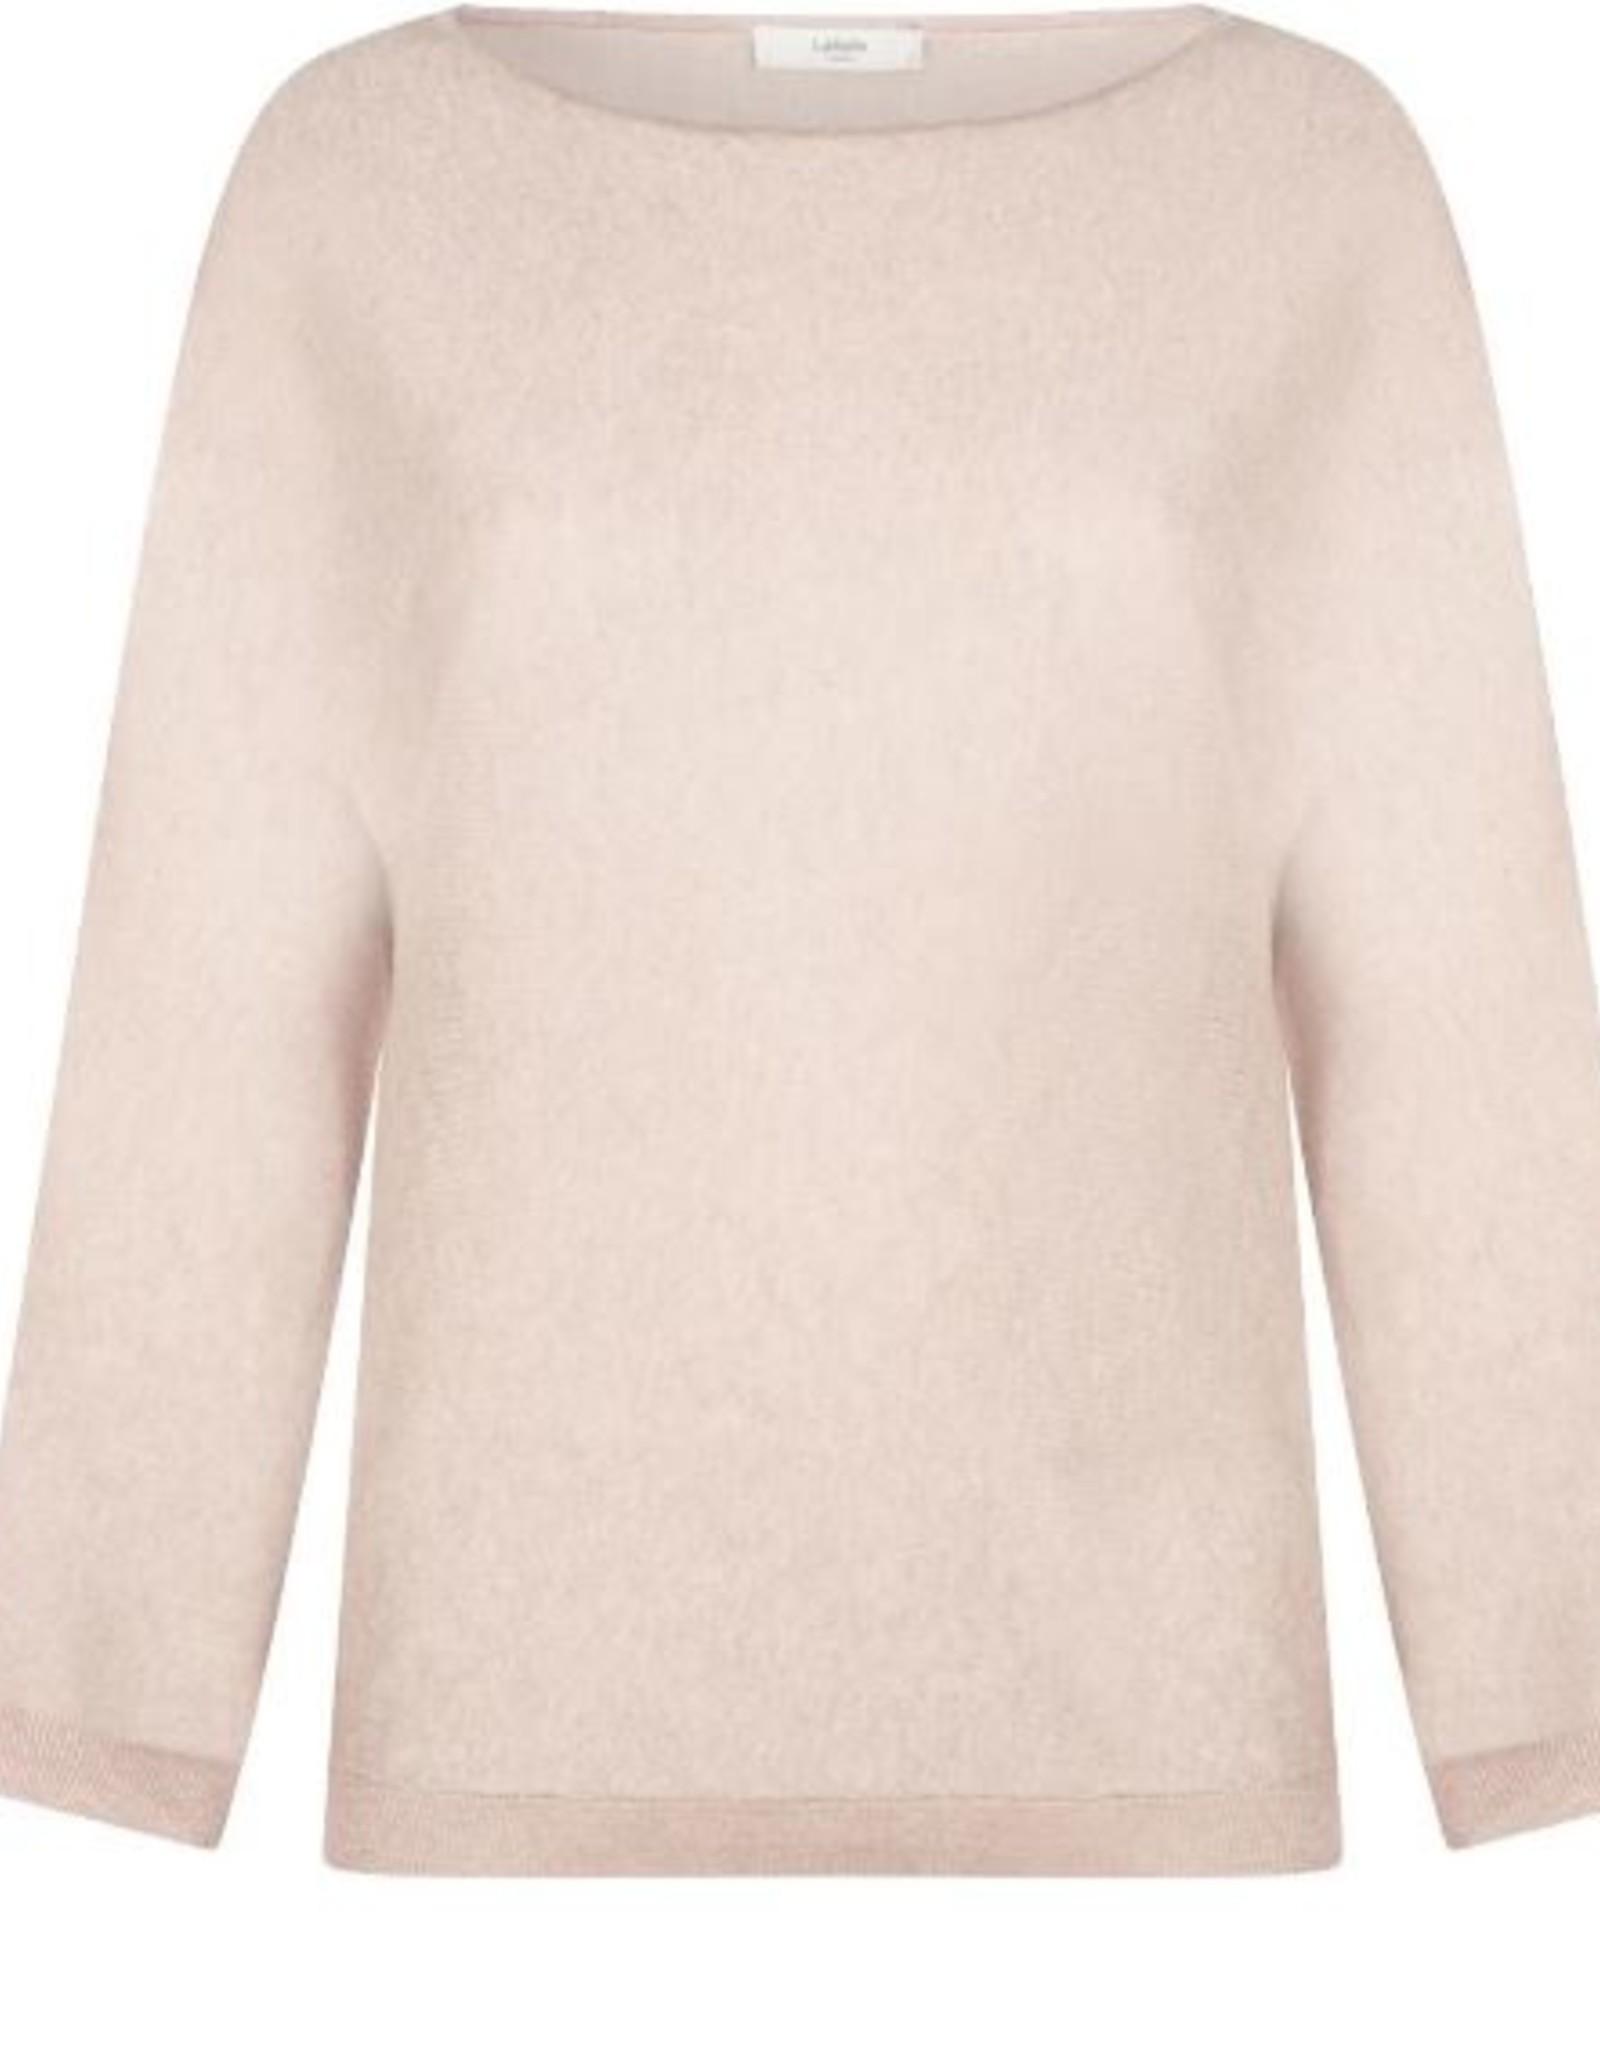 LaSalle Pullover Rose knoop Detail